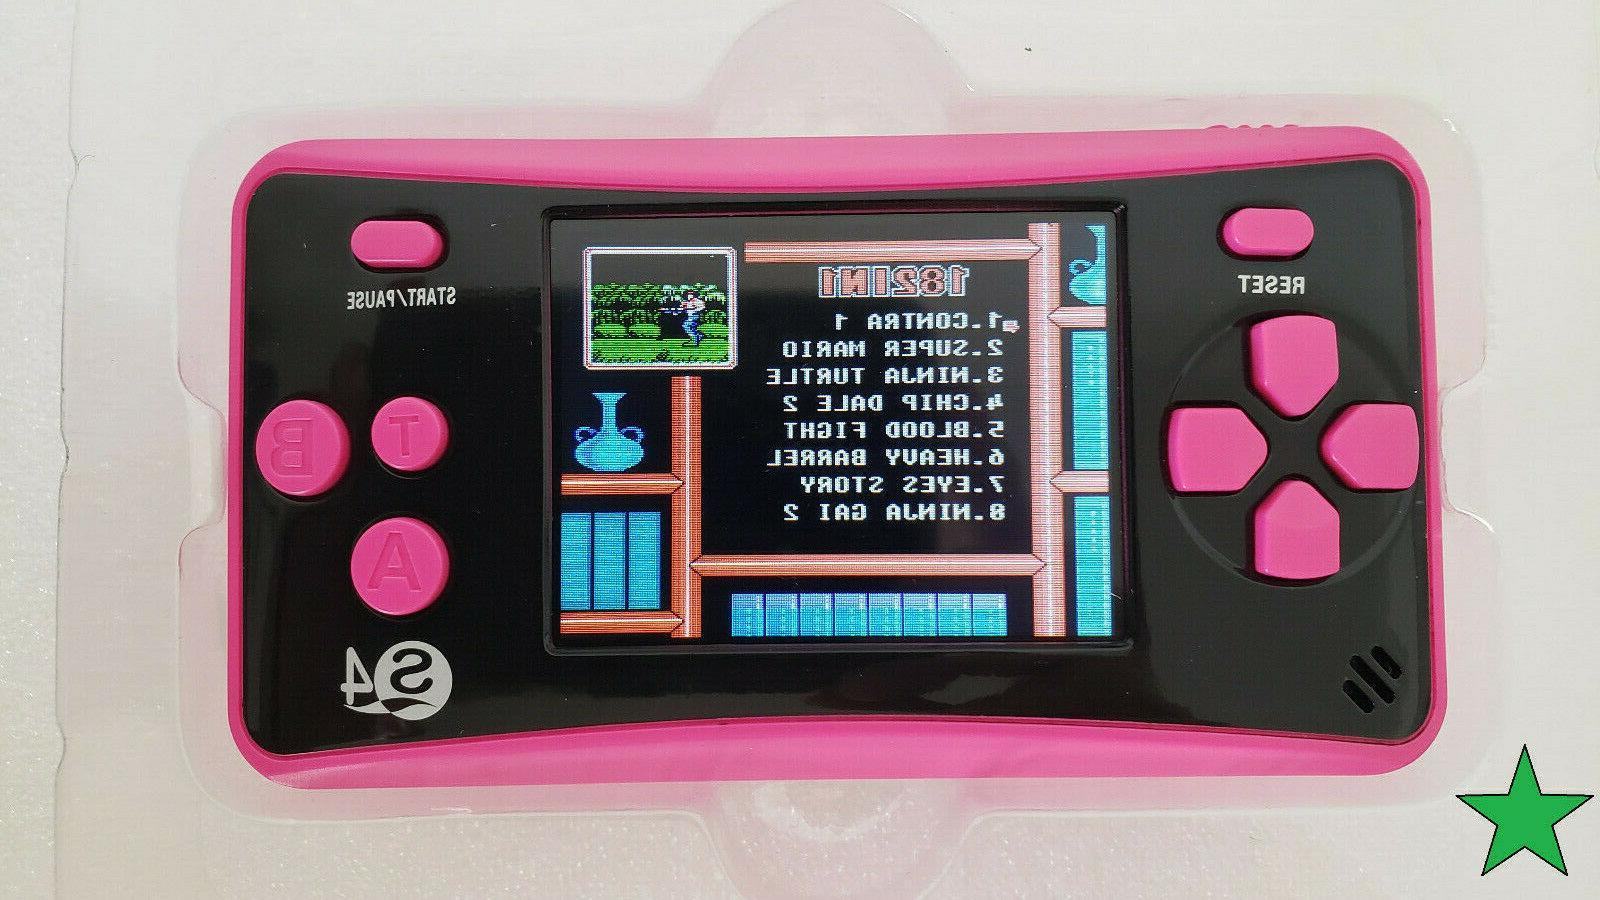 portable handheld games for kids 2 5